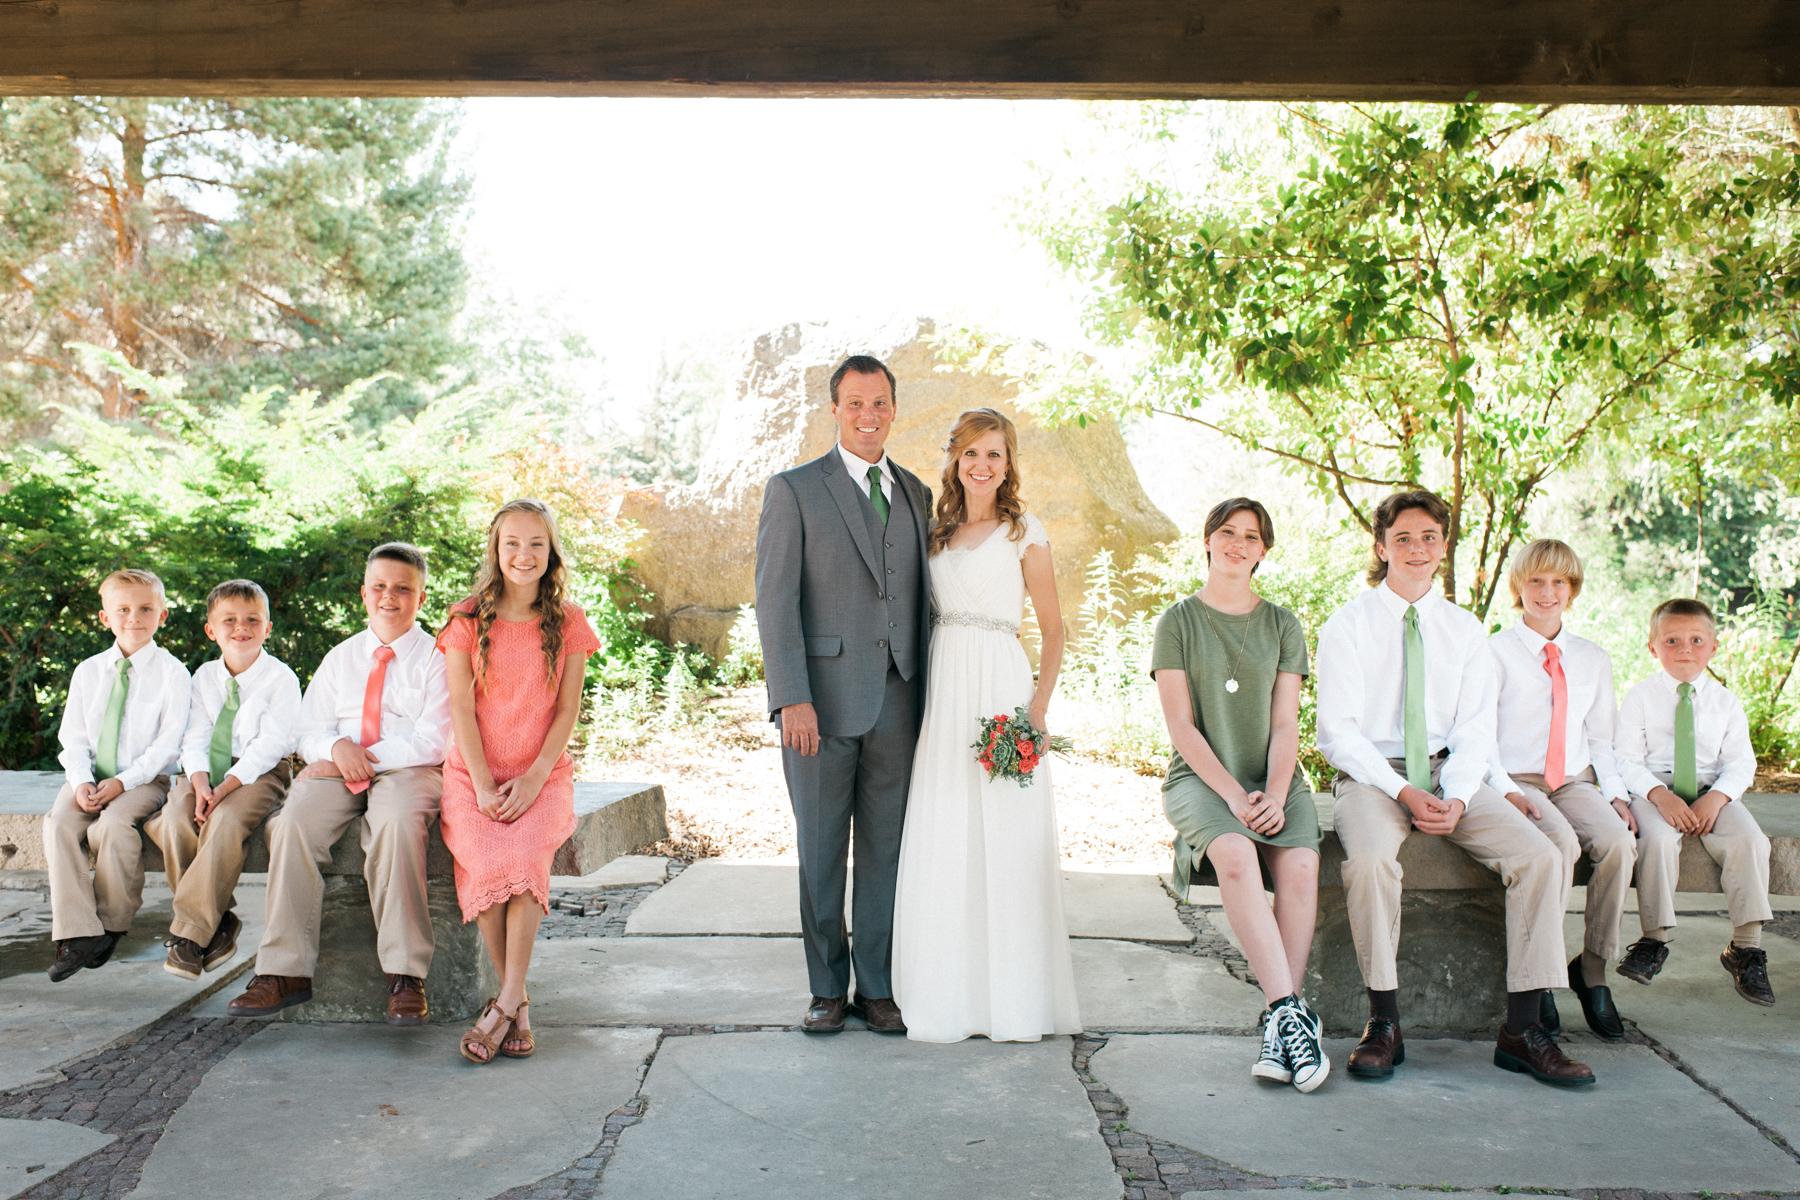 M+R Wedding 116.jpg